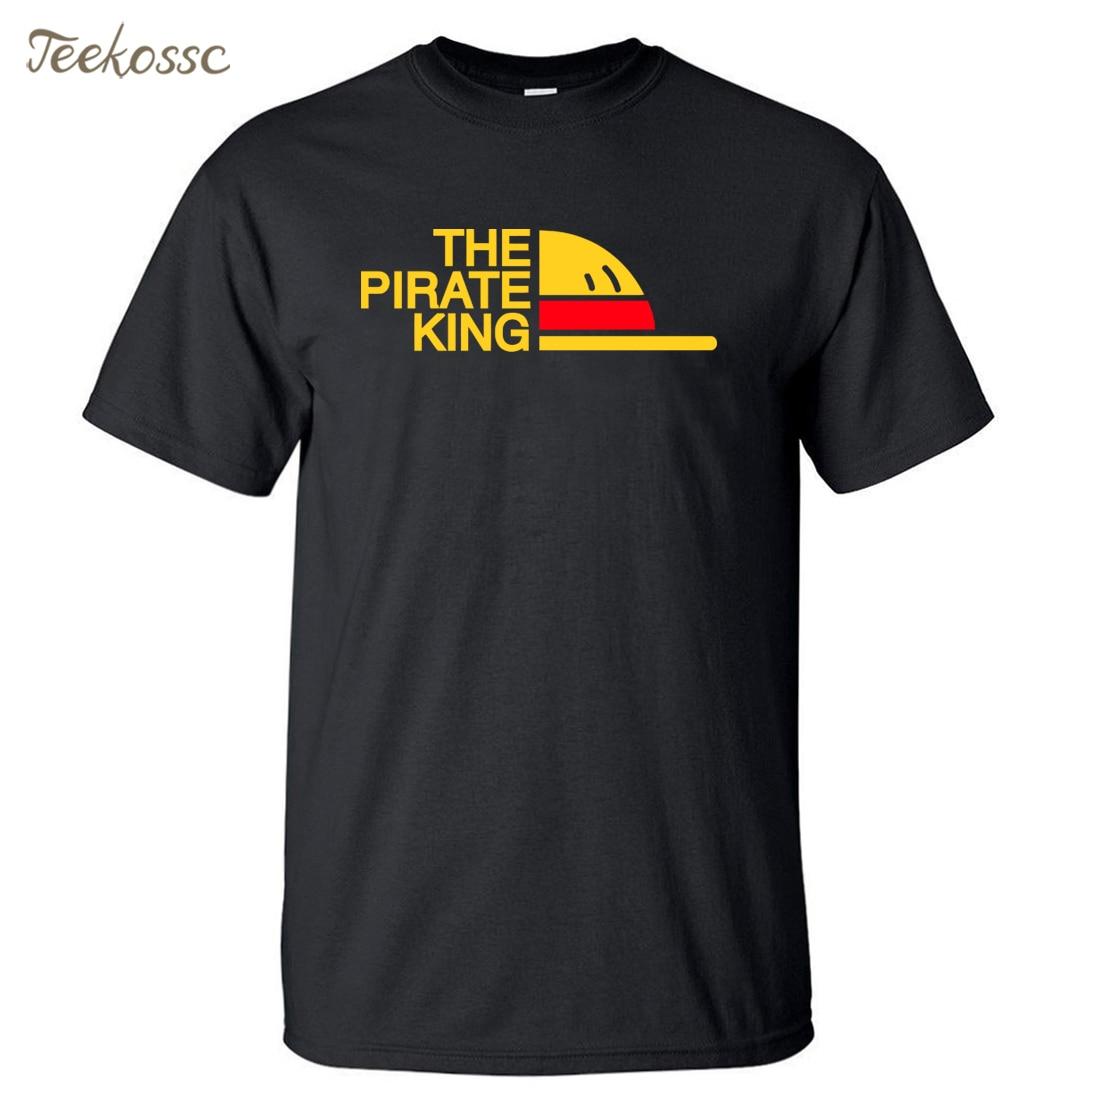 One Piece T Shirt Men The Pirate King T-Shirt Mens Luffy Tshirt Summer Tops Tee Japan Anime Harajuku New Design Camiseta Homme